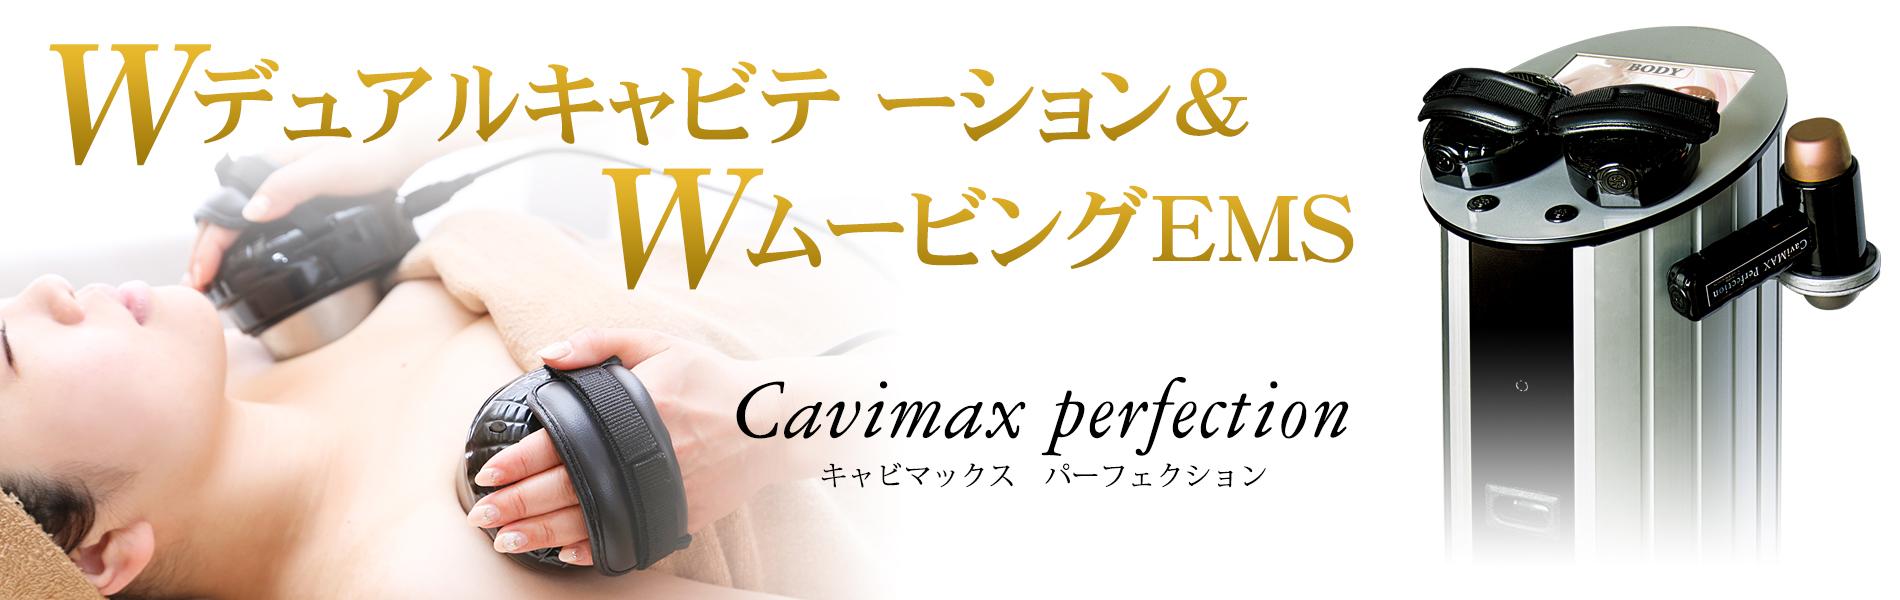 cavimax01